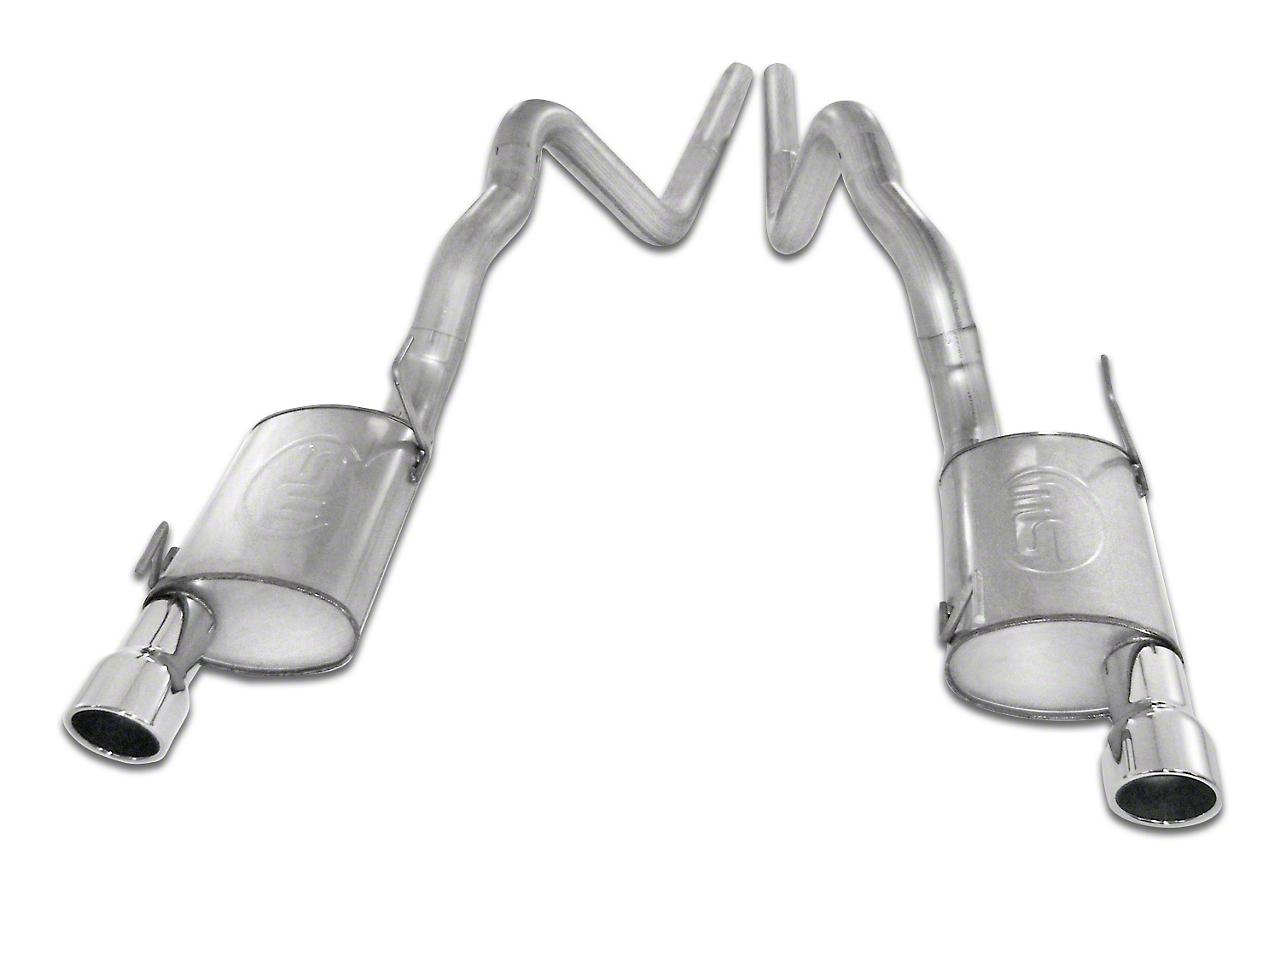 Stainless Works S-Tube Turbo Cat-Back Exhaust (07-10 GT500 w/ Long Tube Headers)